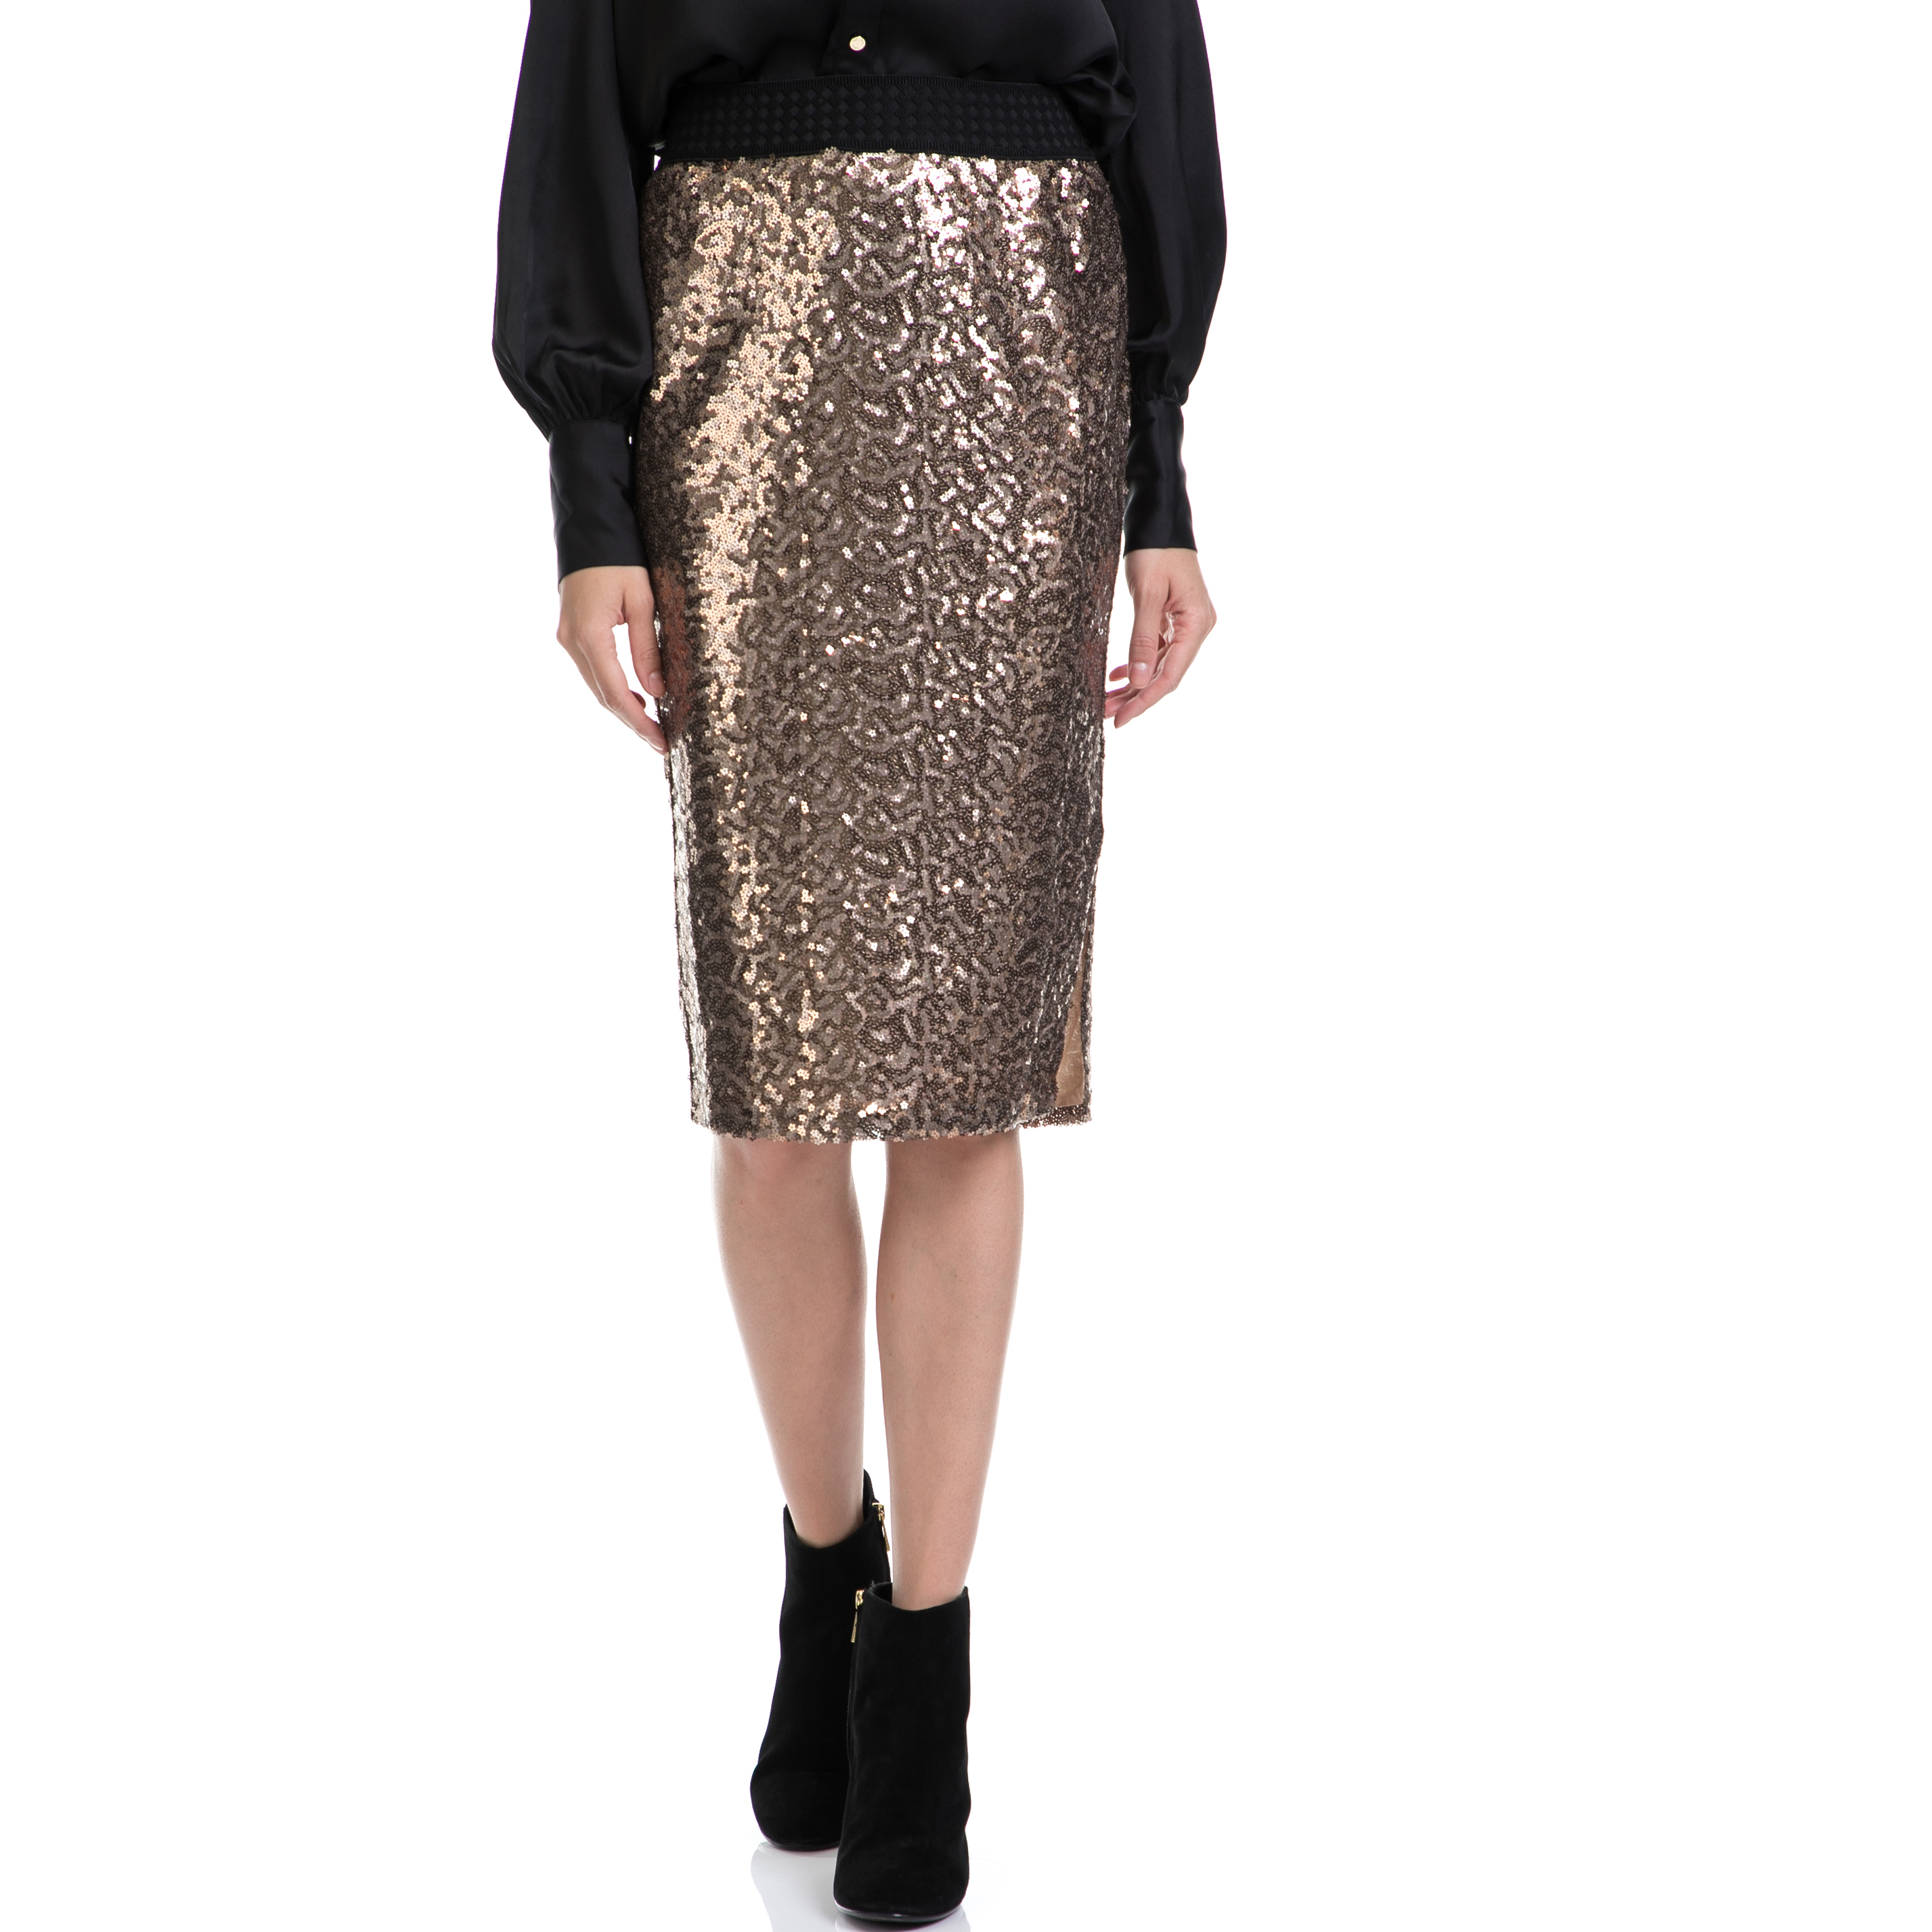 JUICY COUTURE - Γυναικεία φούστα JUICY COUTURE χρυσή γυναικεία ρούχα φούστες μέχρι το γόνατο